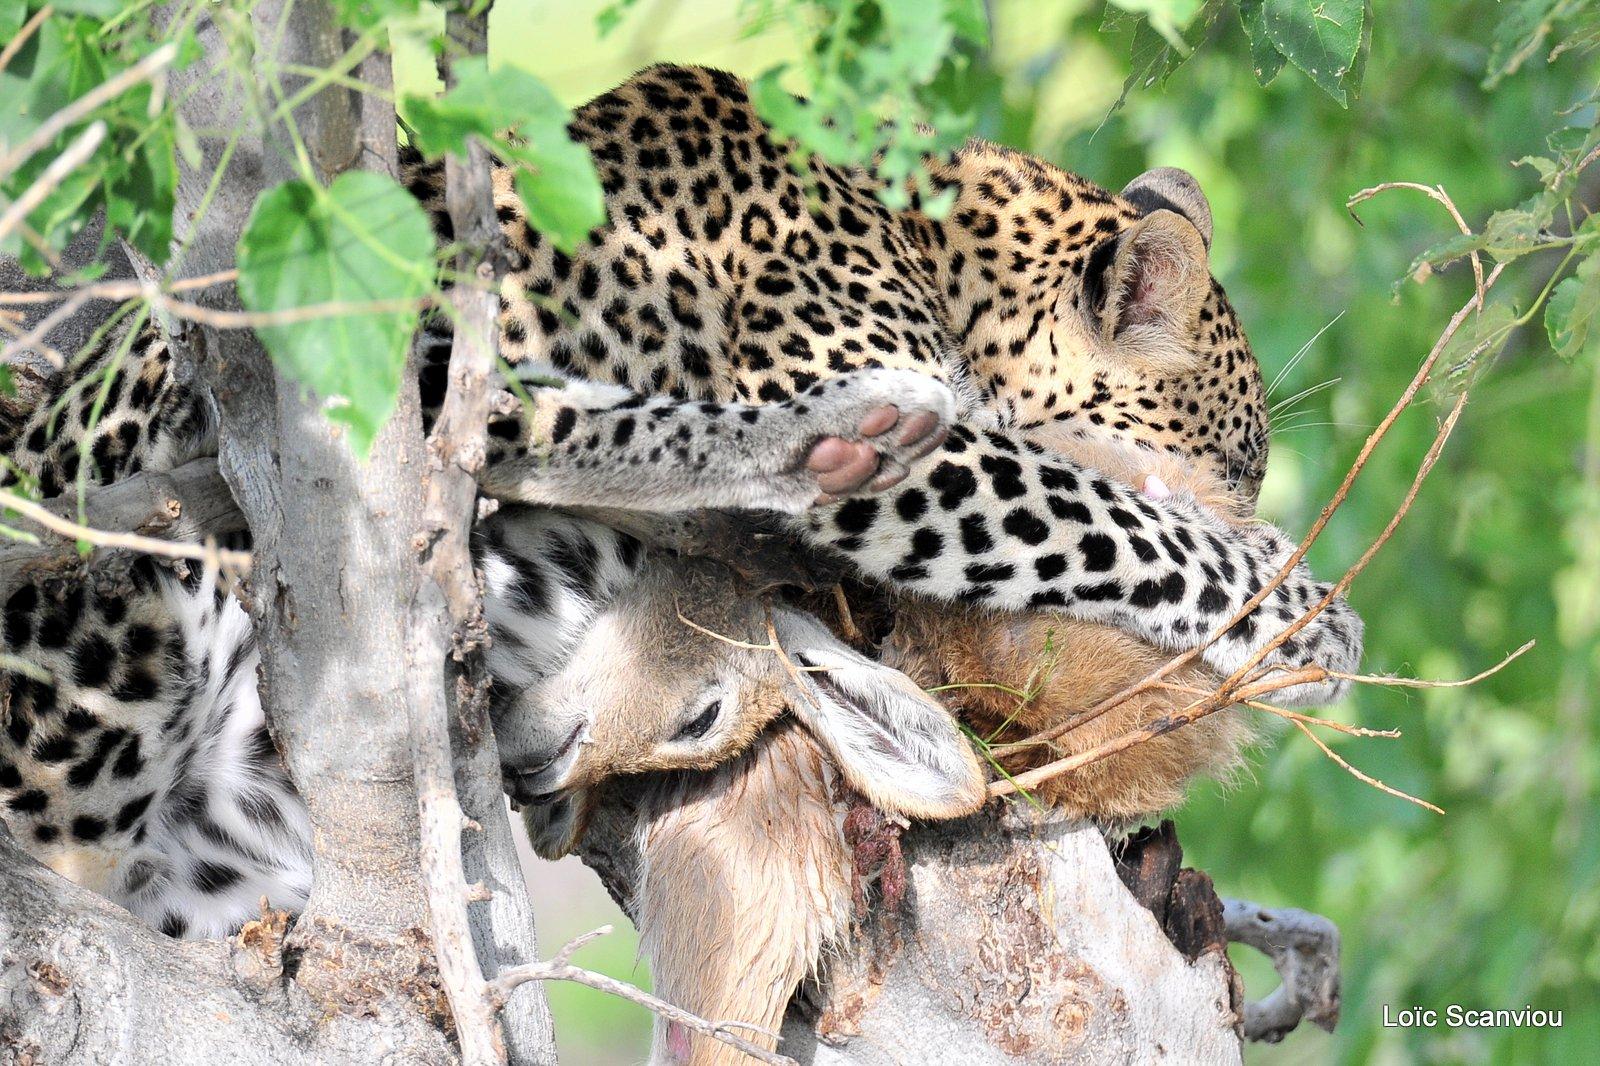 Léopard qui mange/Leopard eating (1)